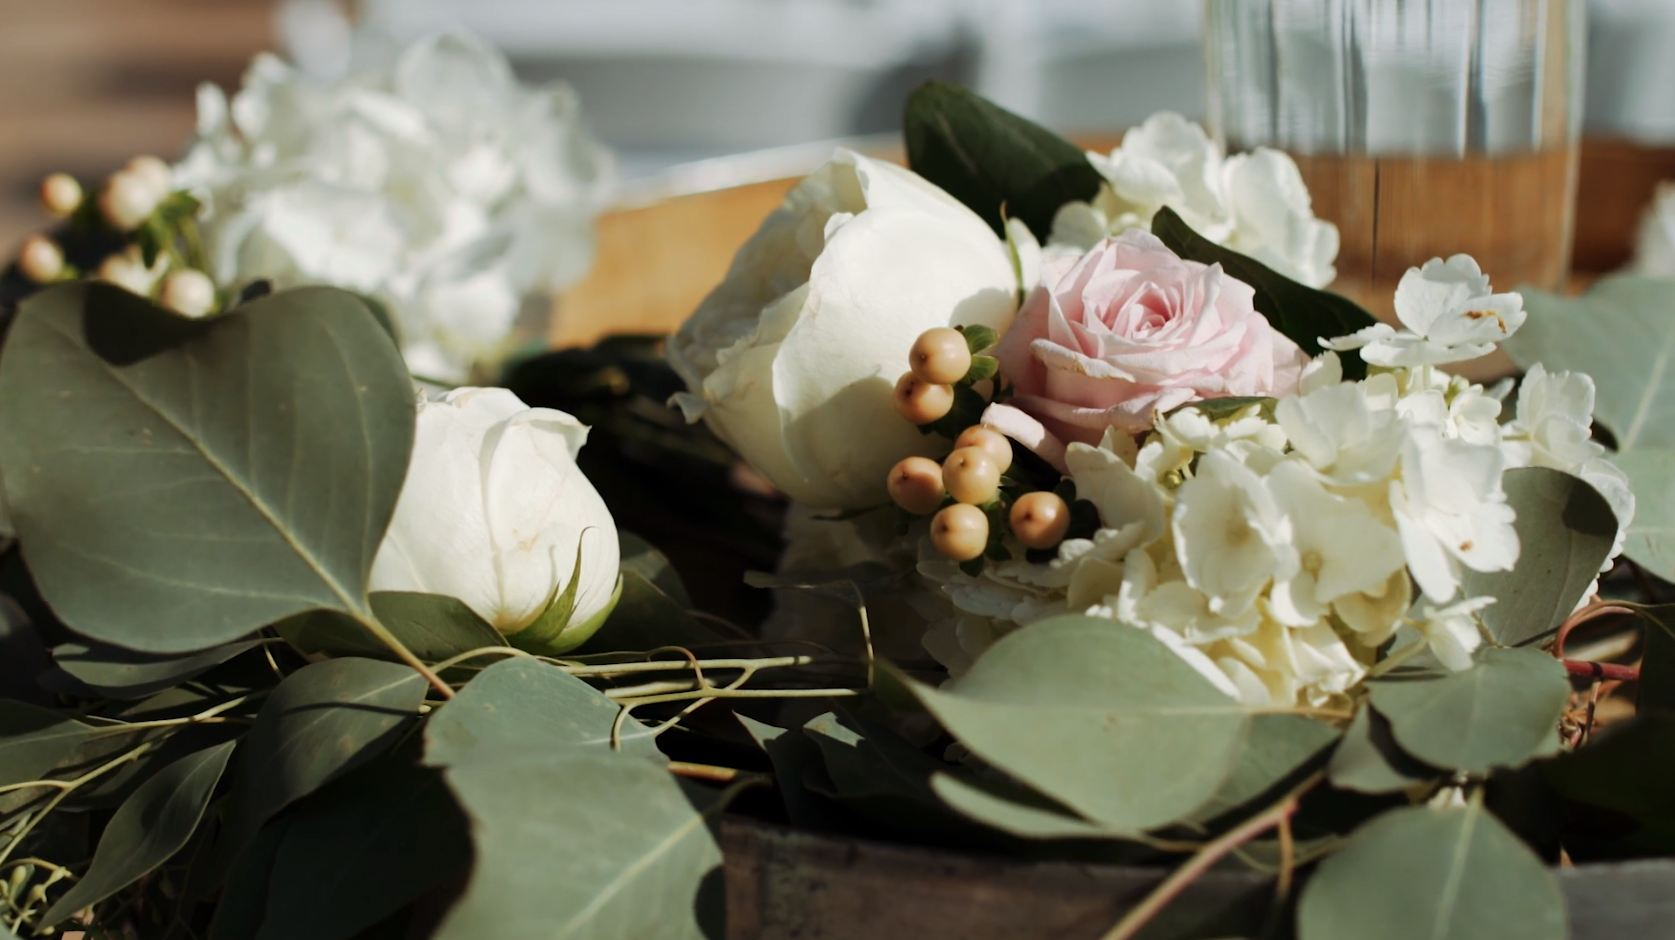 - Stunning floral arrangement made by Green Leaf Designs